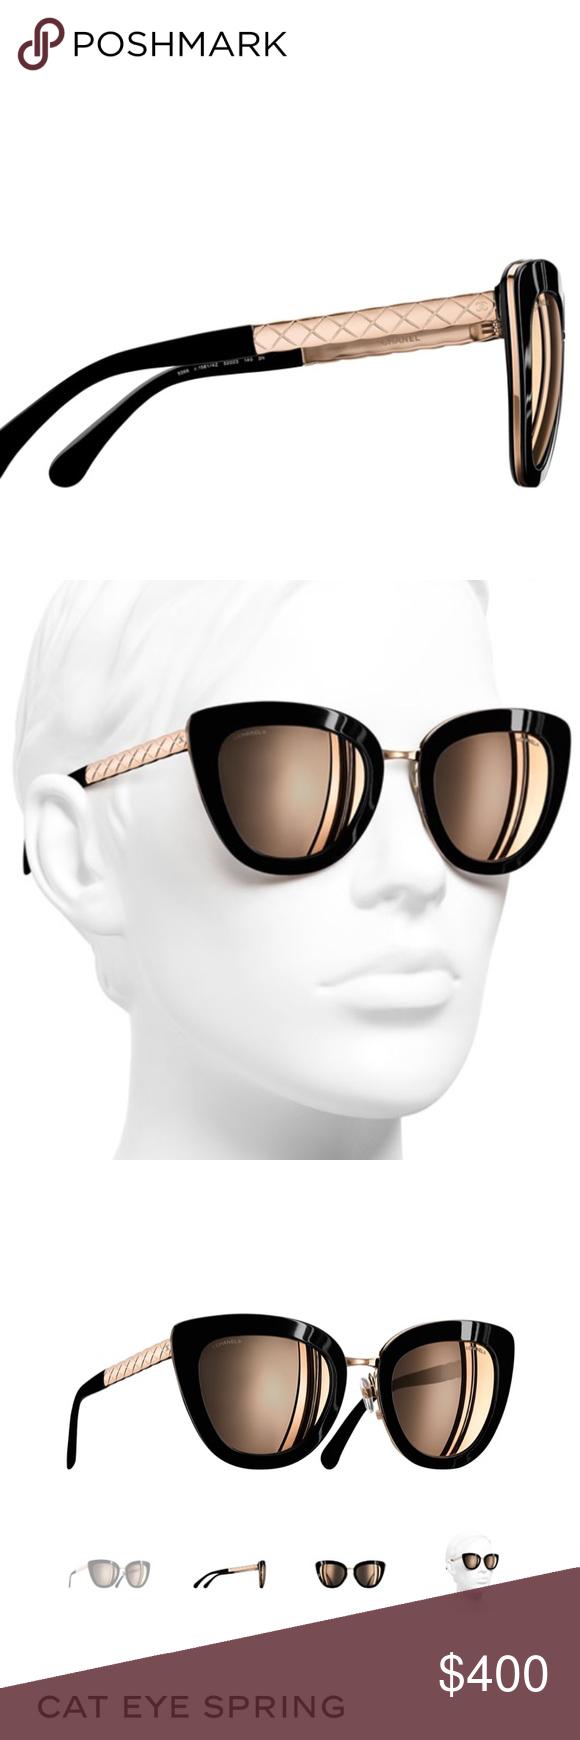 c10836affca Chanel Sunglasses Brand new